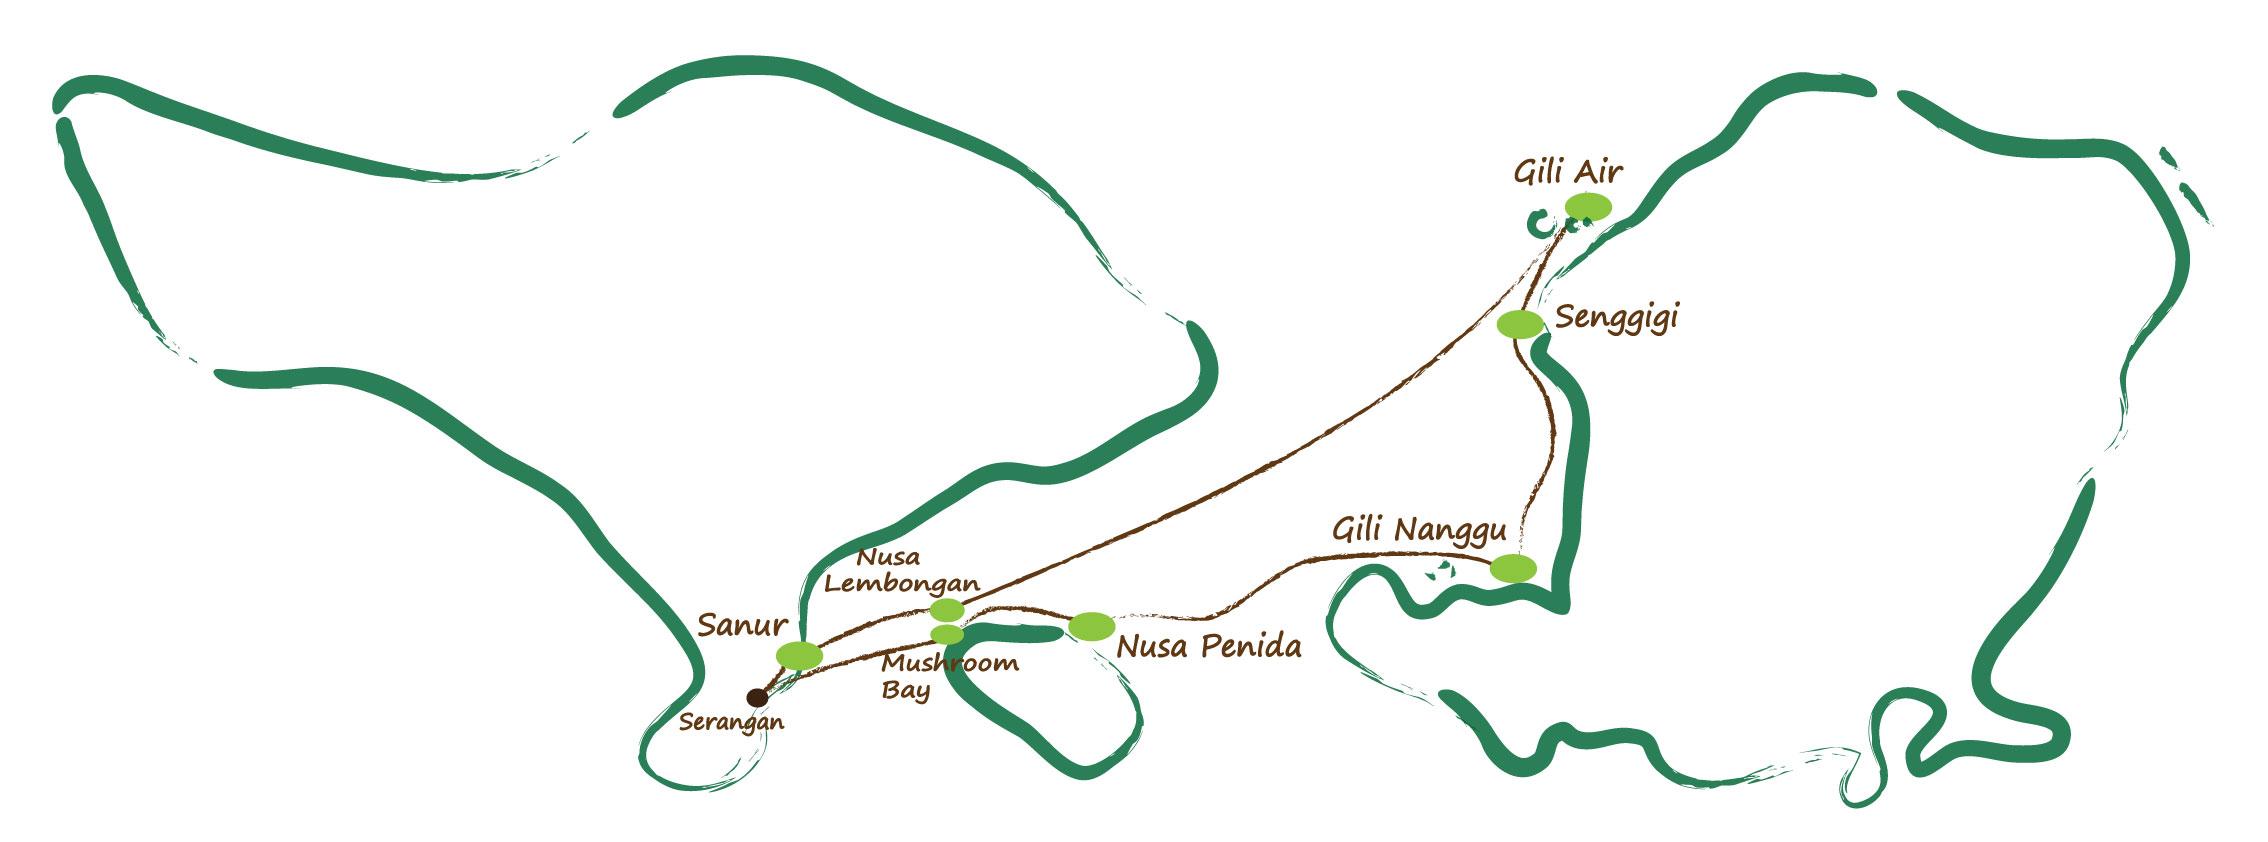 Carte Bali Serangan.Circuit Prive Bali Indonesie Croisiere Bali Lombok